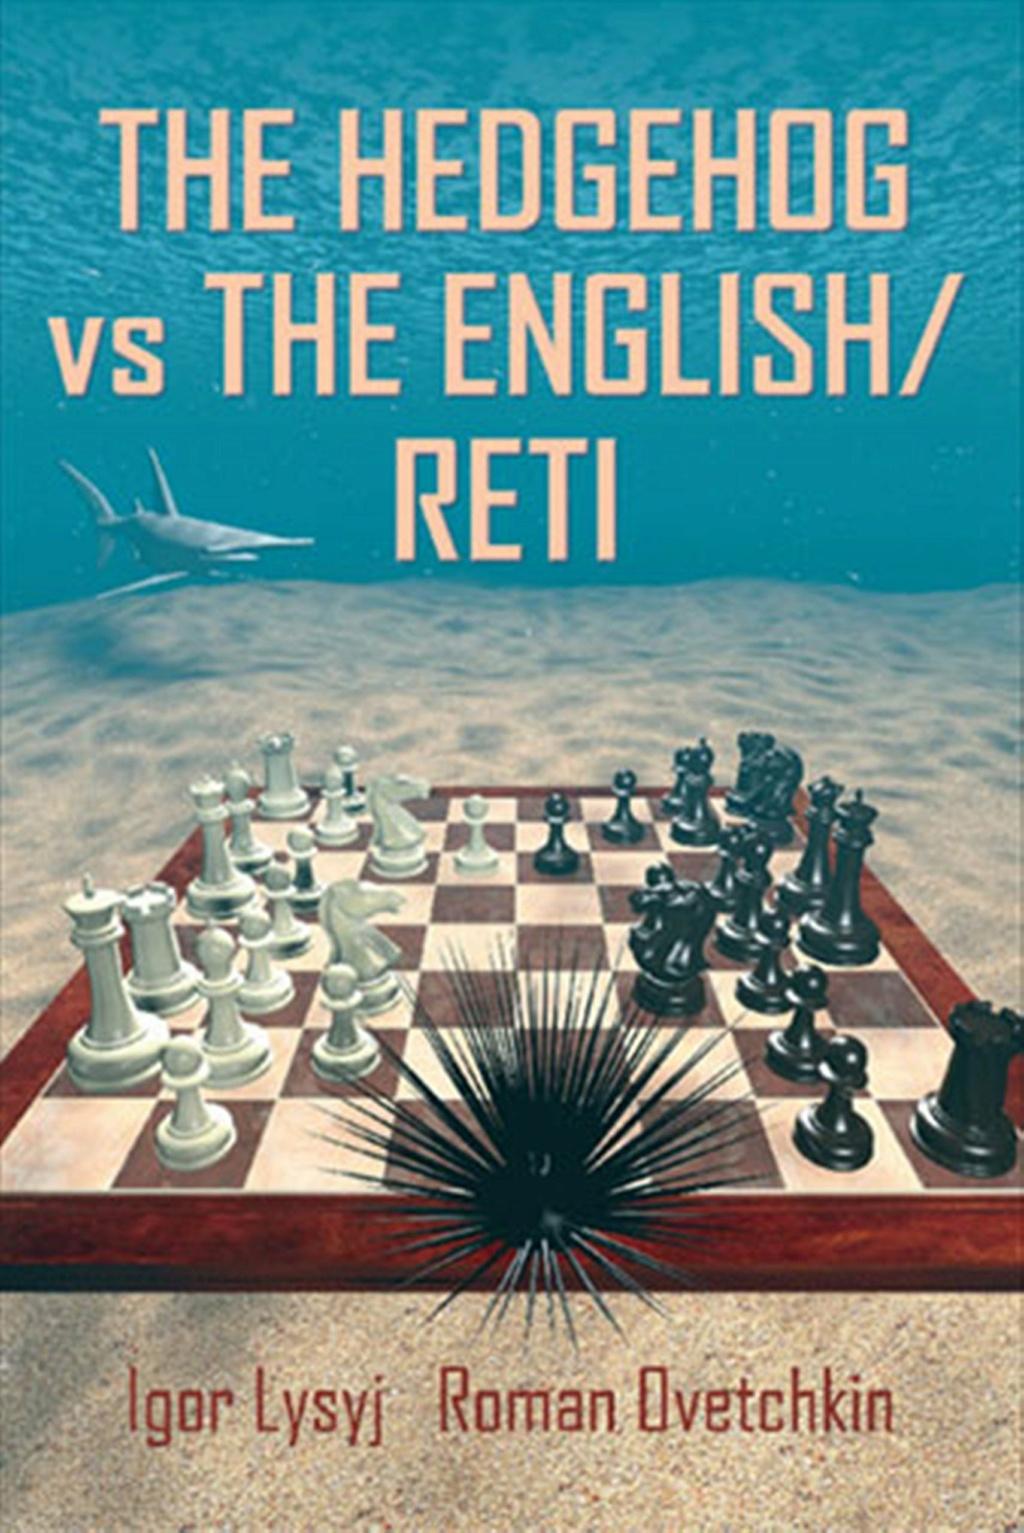 Igor Lysyj and Roman Ovetchkin_The Hedgehog vs the English Reti_PDF+PGN Ggg10